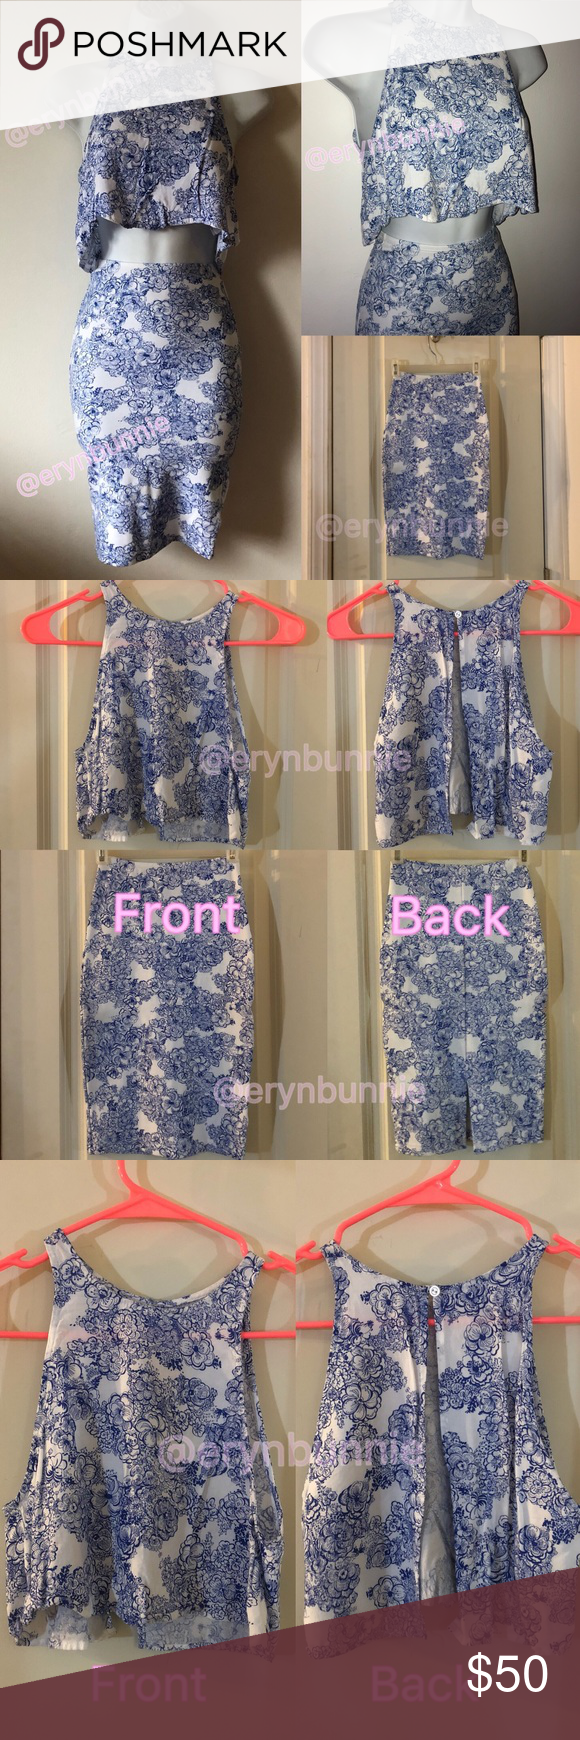 American Apparel Top & Skirt Set • XS AA matching 2 piece